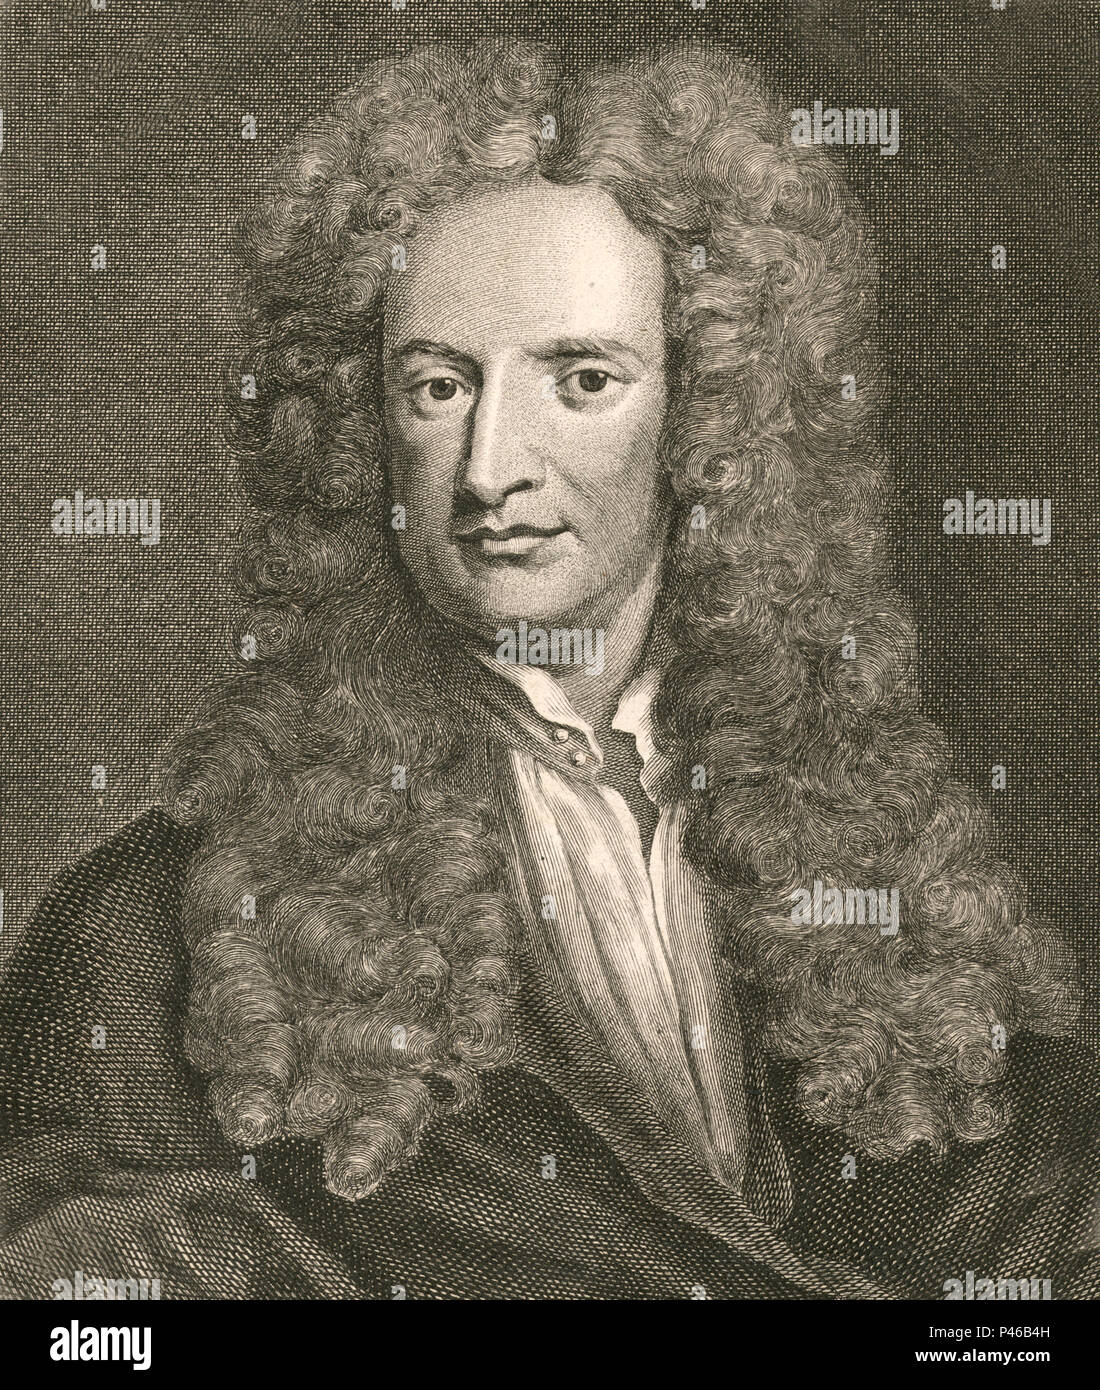 Sir Isaac Newton (1642 – 1726/27) English mathematician, astronomer, physicist - Stock Image